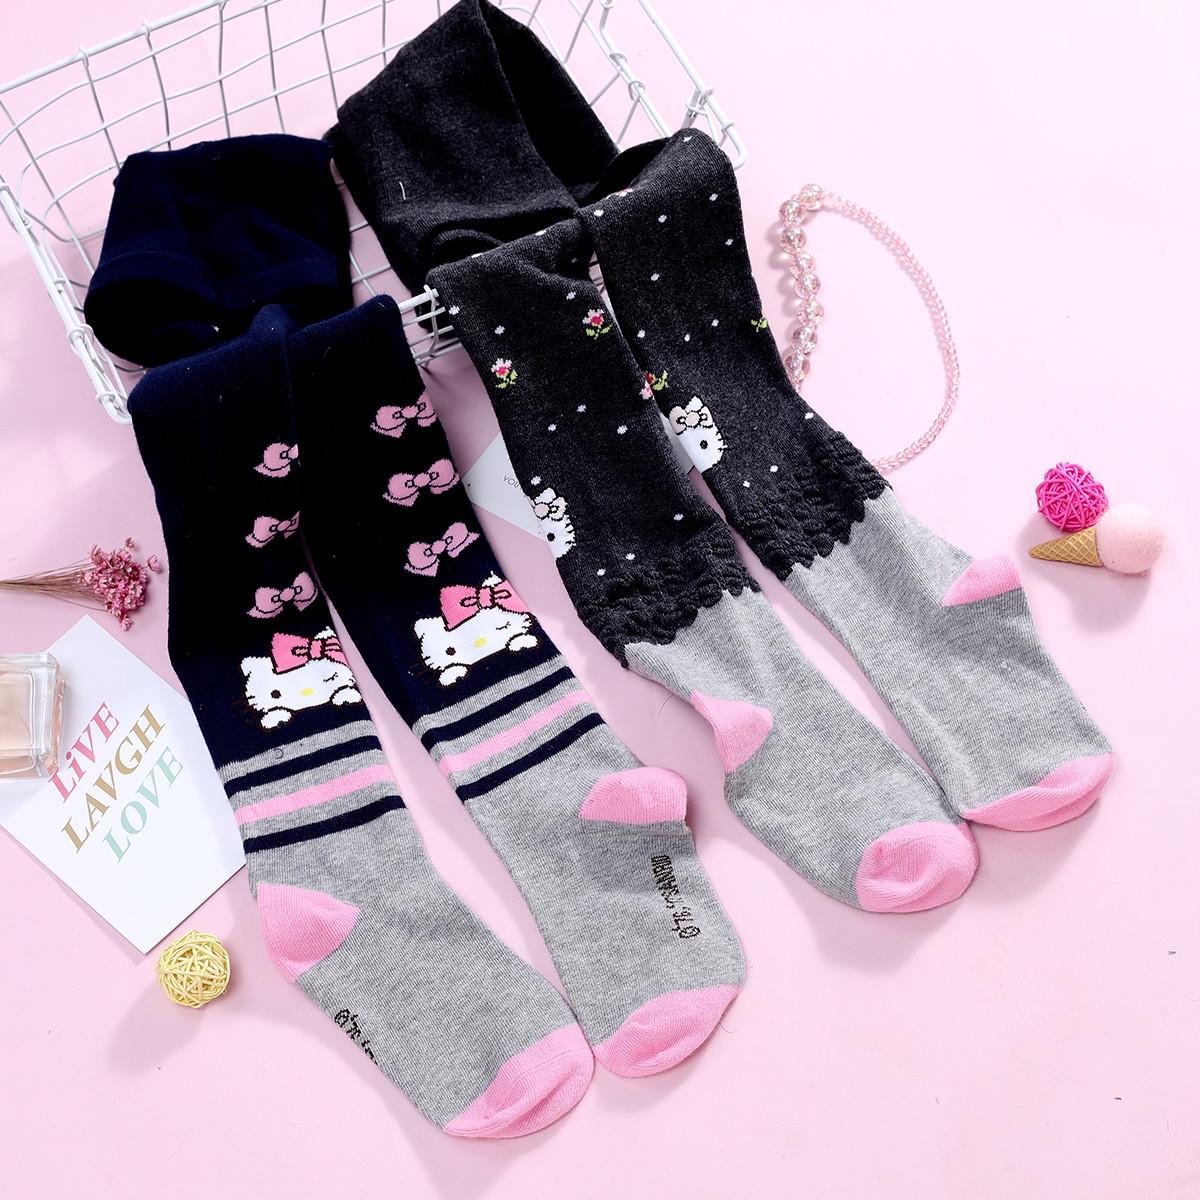 HELLO KITTYHELLO KITTY女童连裤袜2条装(图案随机发)XJKT8015BE